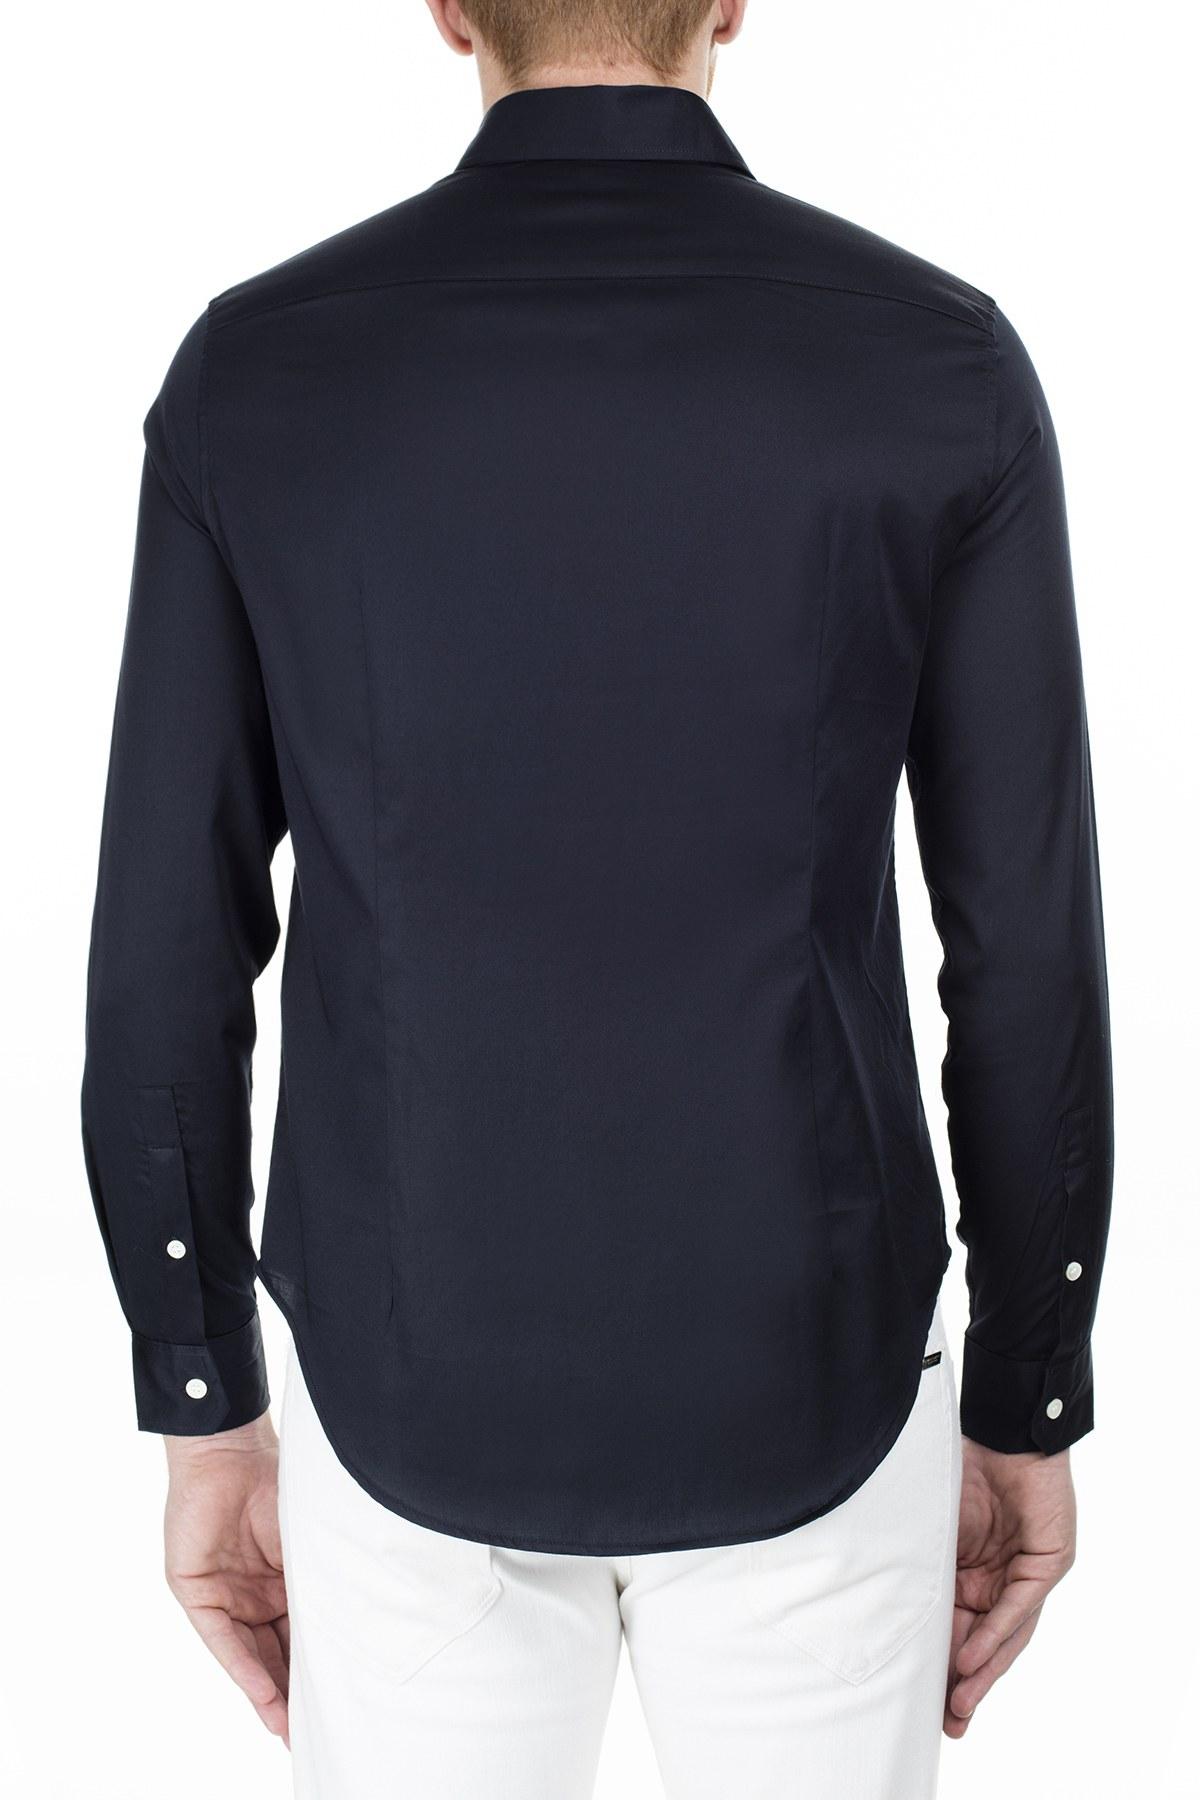 Emporio Armani Slim Fit Erkek Gömlek 3H1CN5 1NJJZ 0920 LACİVERT